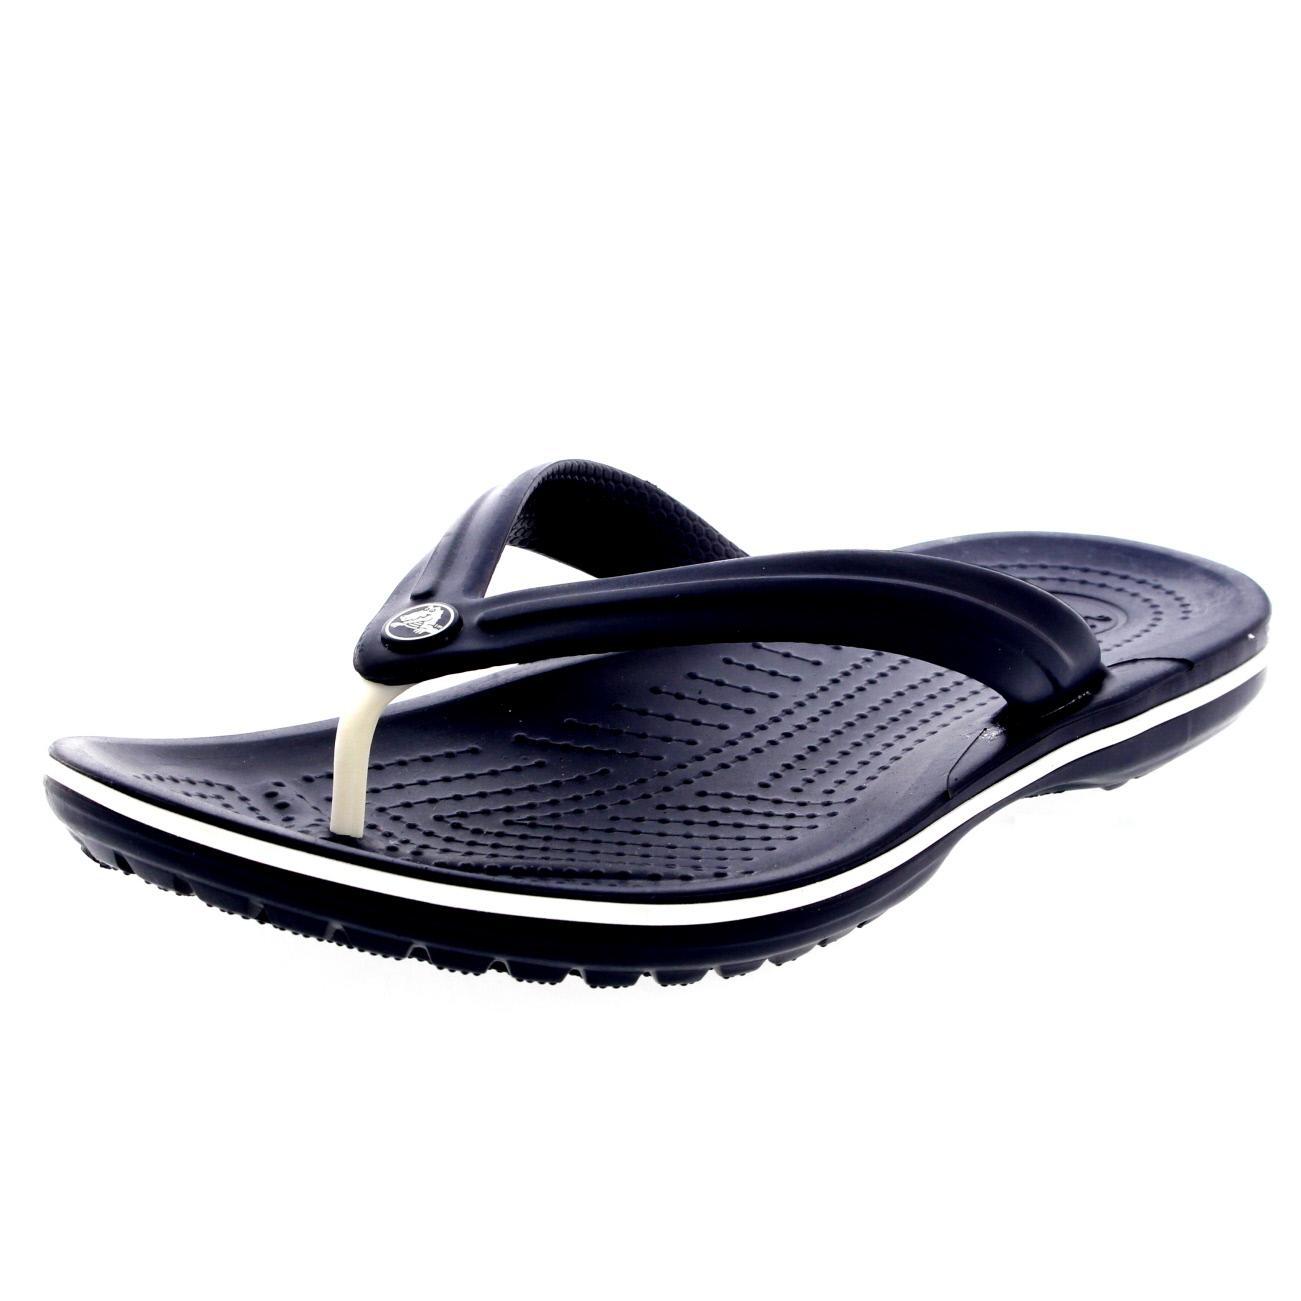 unisex mens womens crocs crocband flip slip on slipper. Black Bedroom Furniture Sets. Home Design Ideas